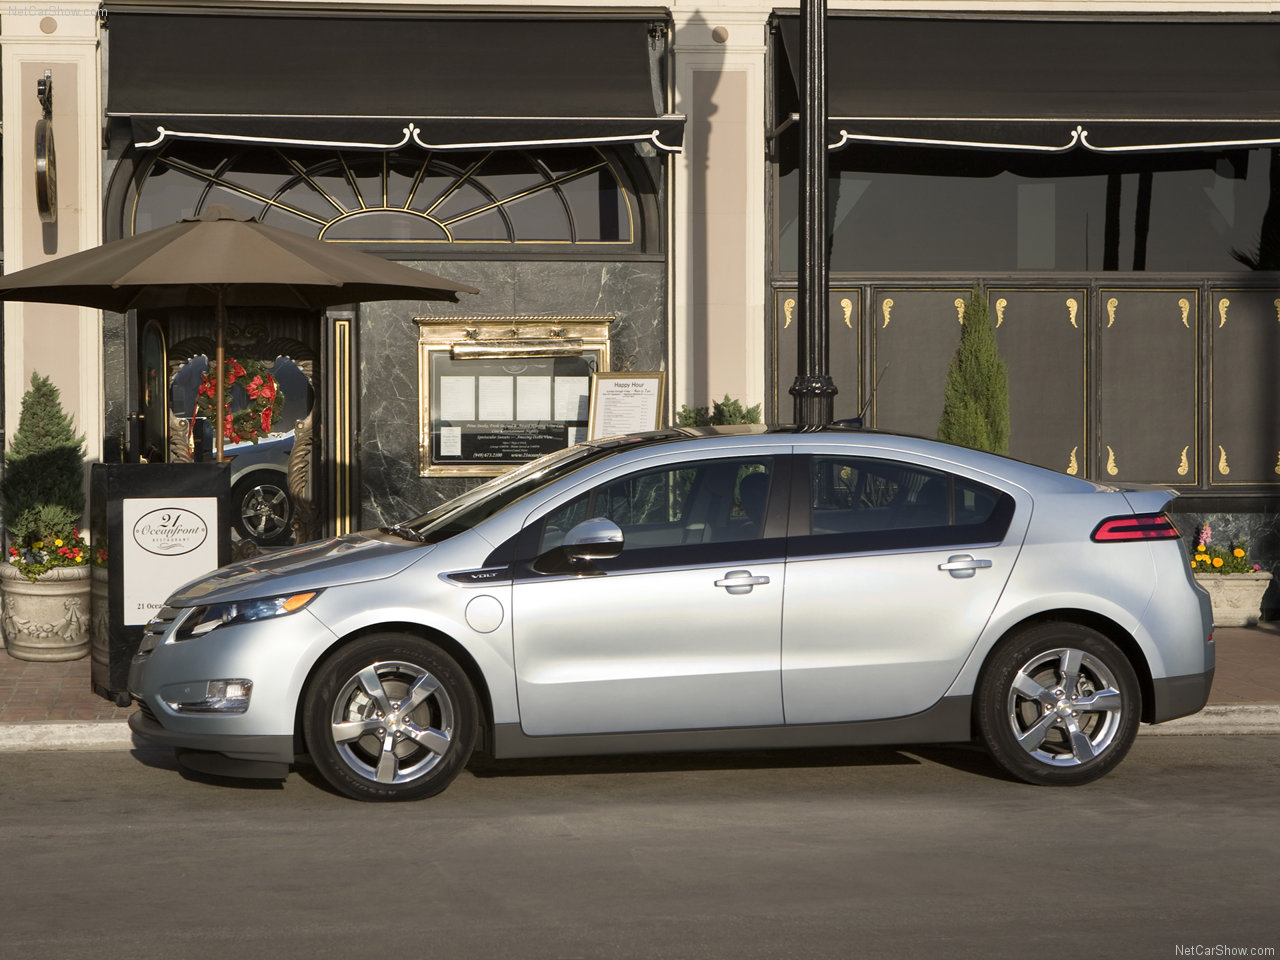 General Motors Paint Codes 2014 Camaro.html | Autos Post